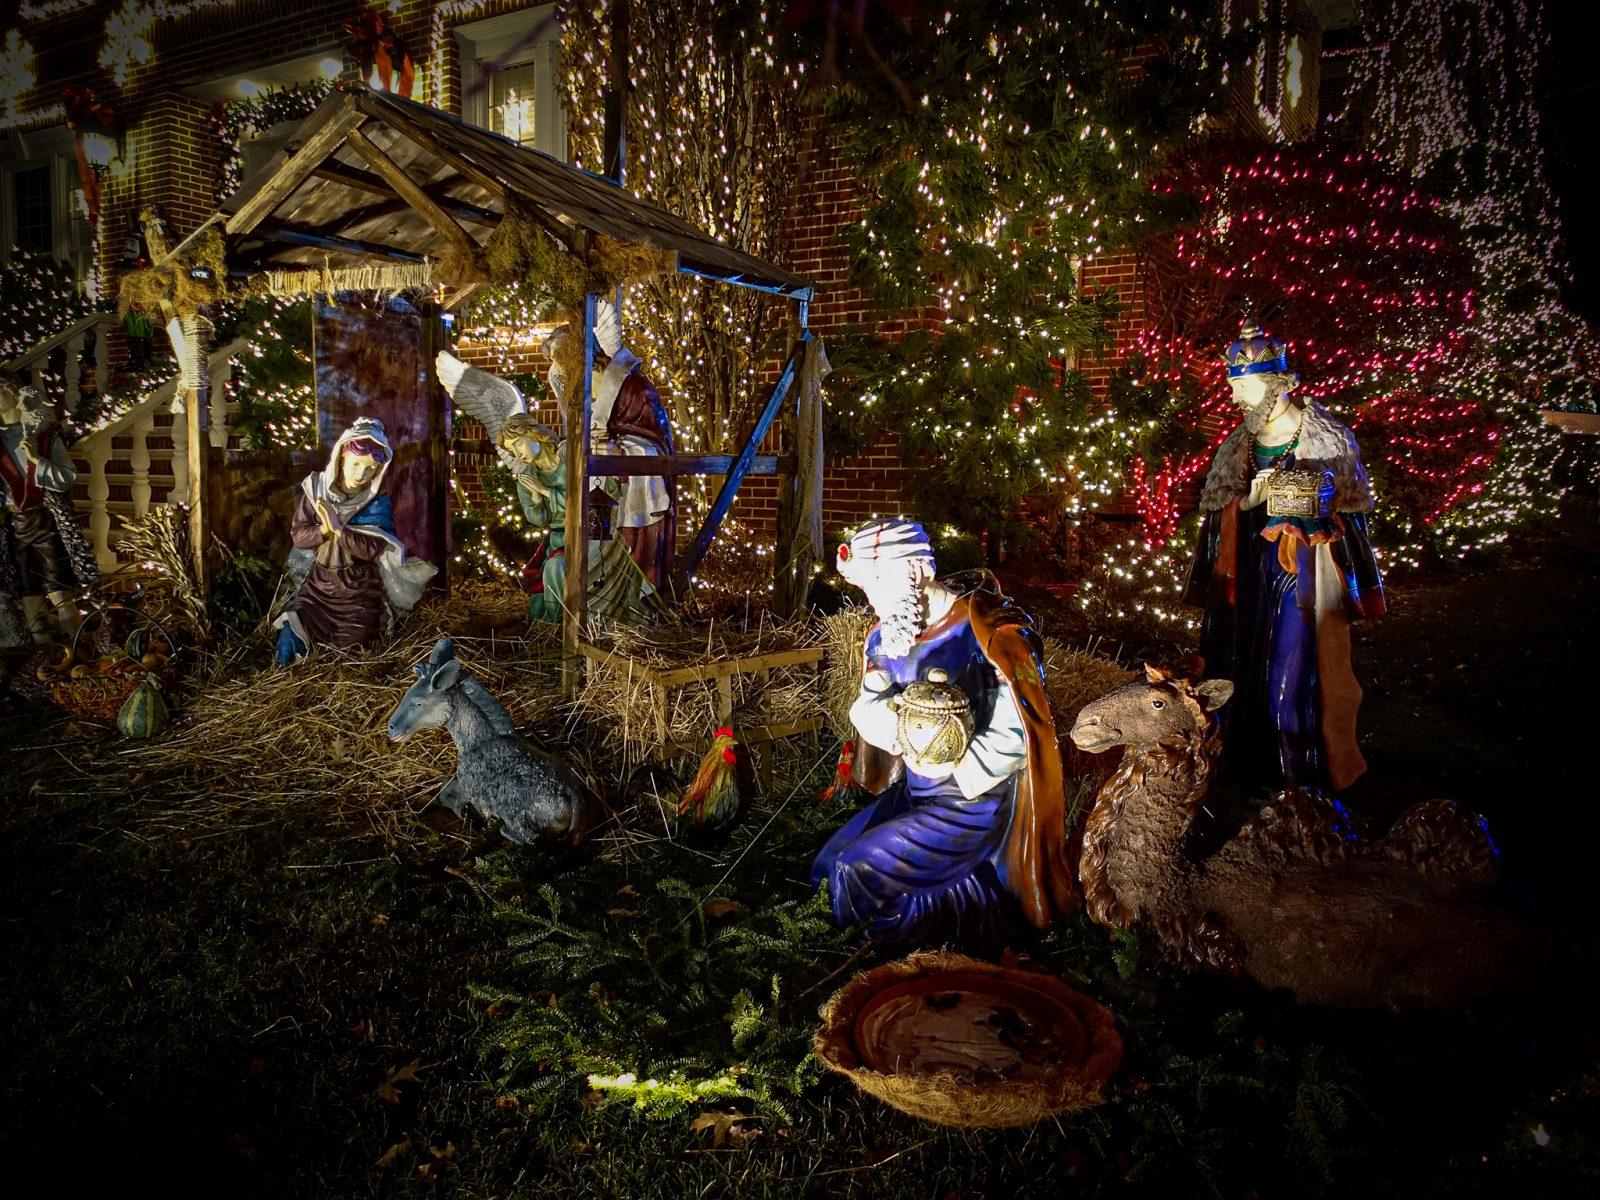 julekrybbe med maria josef og jesusbarnet